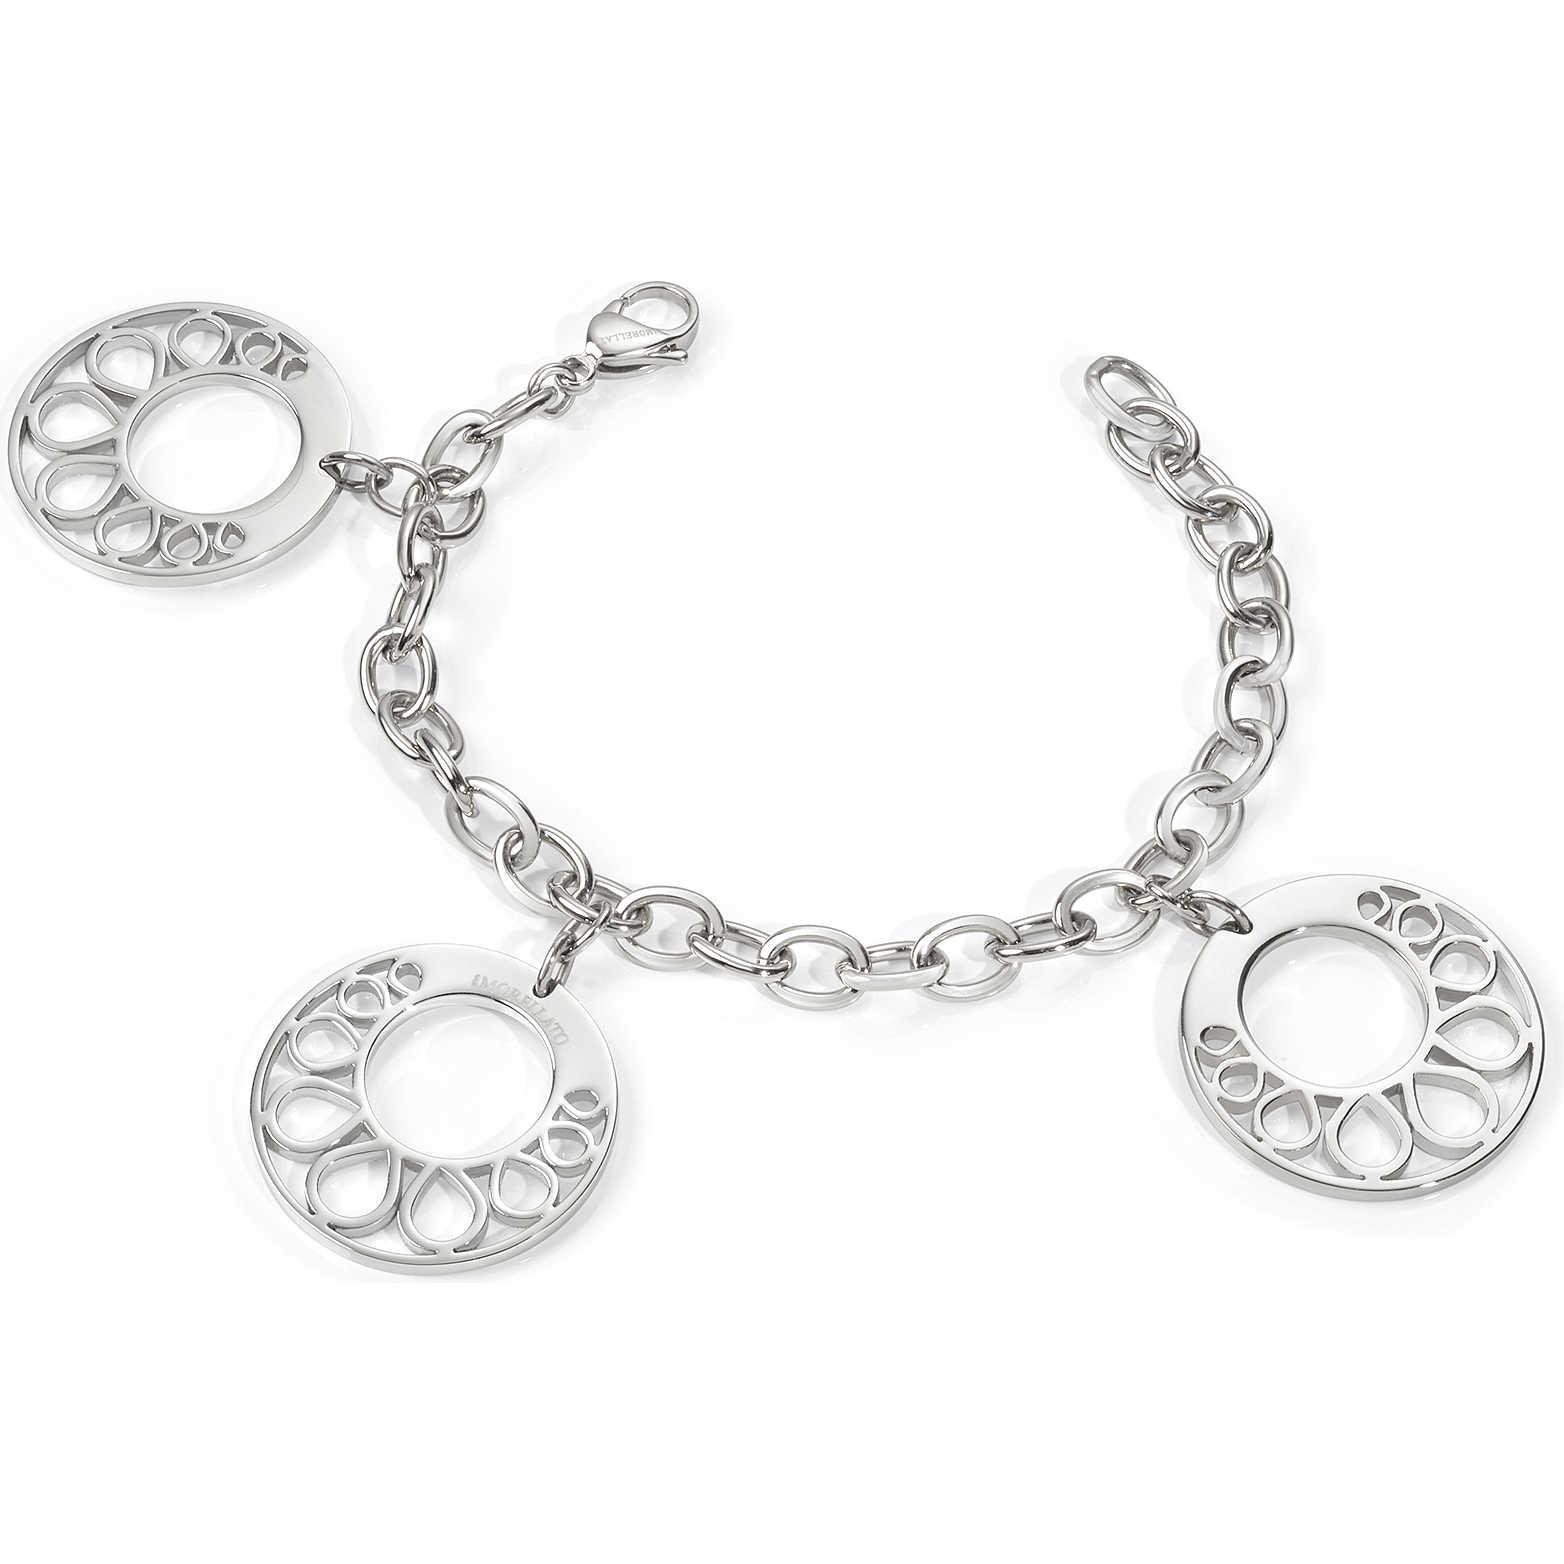 Bracelete feminino Morellato SYB03 (18 cm)